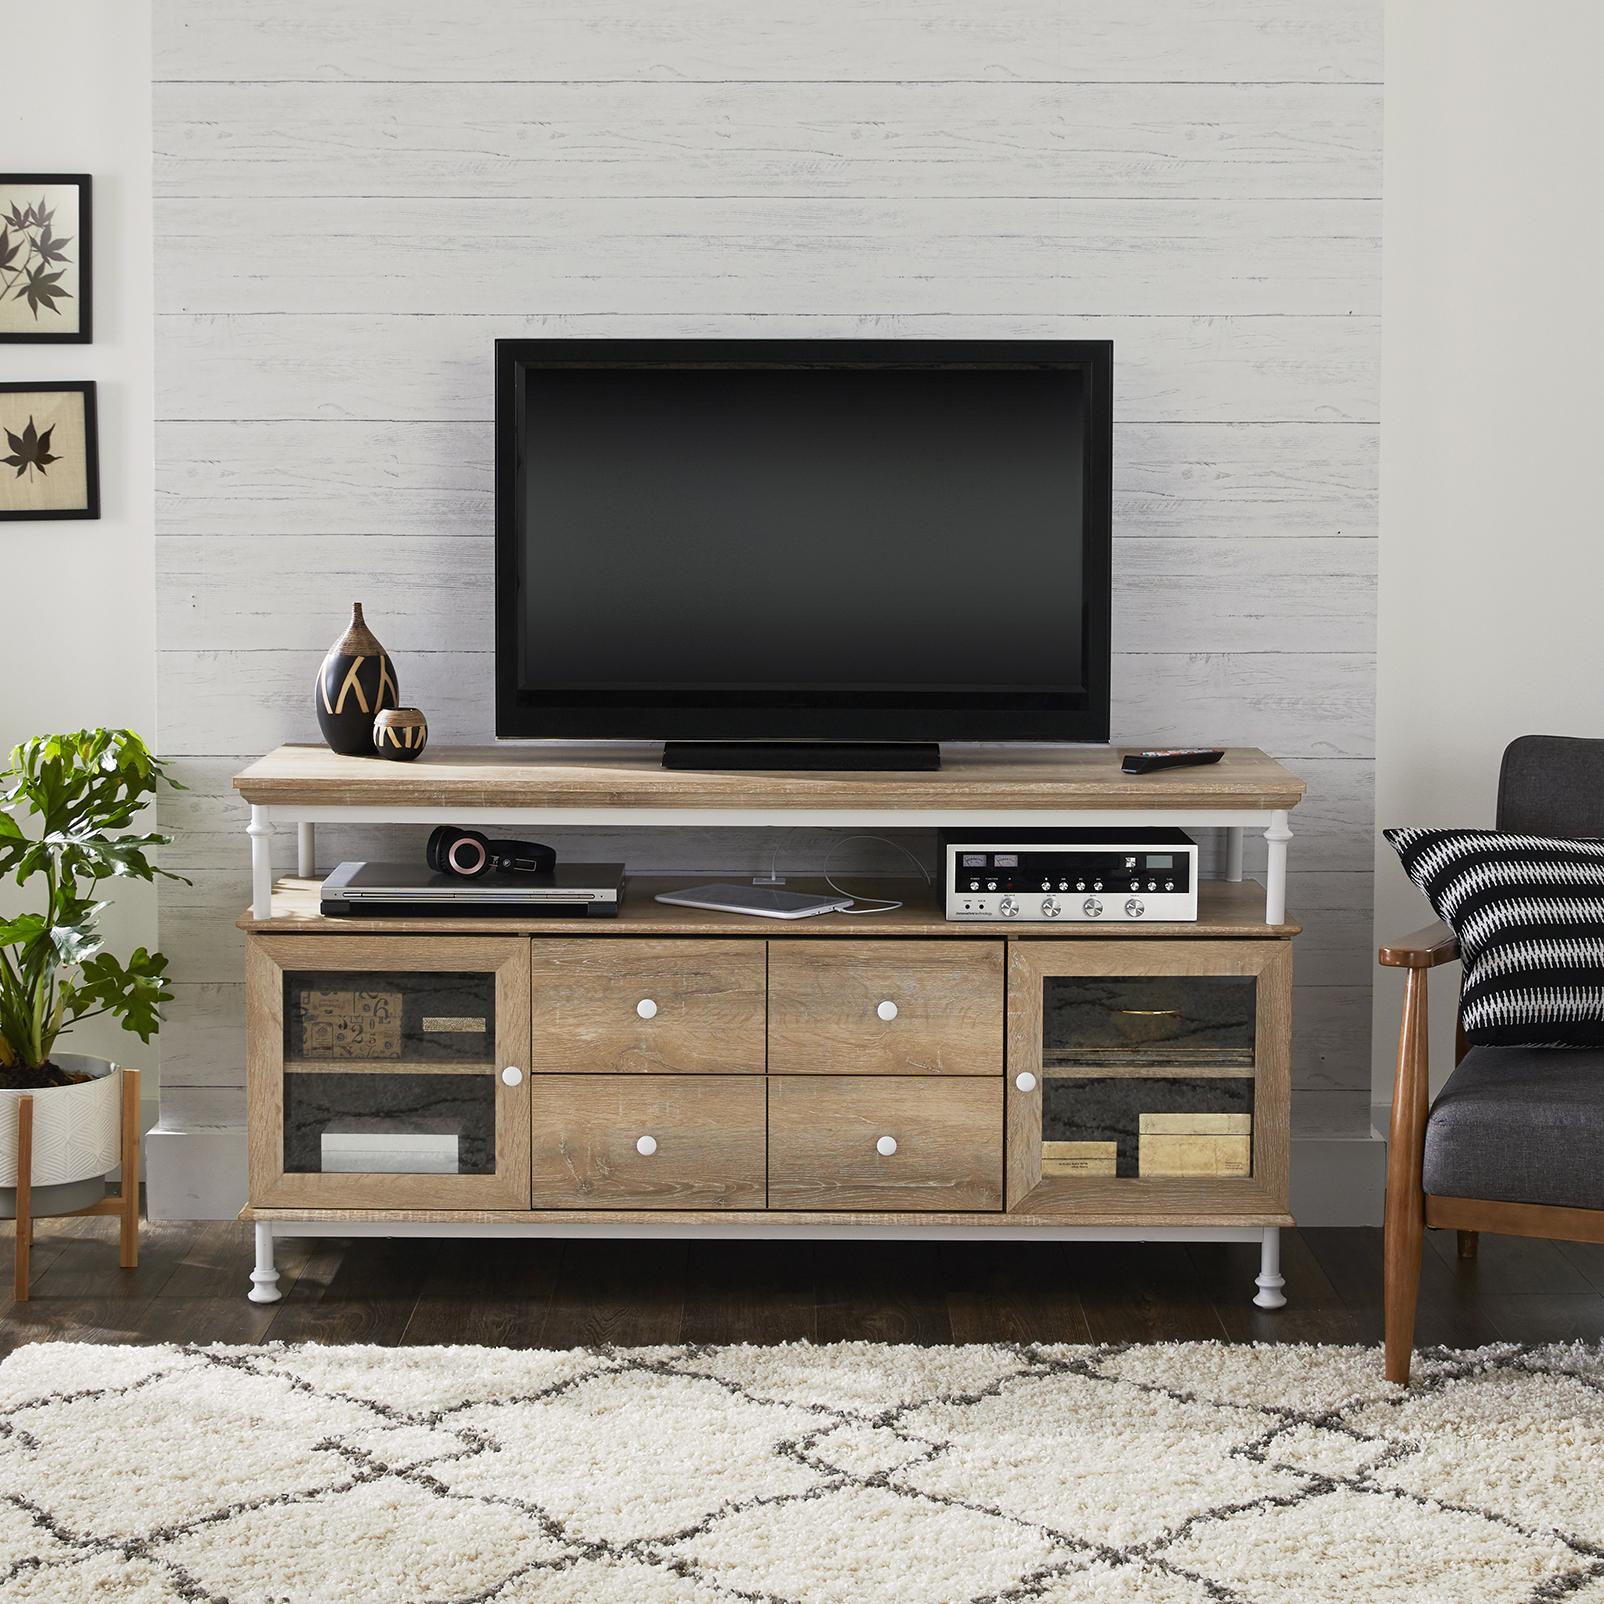 "Better Homes & Gardens River Crest TV Stand for TVs up to 60"", Light Oak Finish"